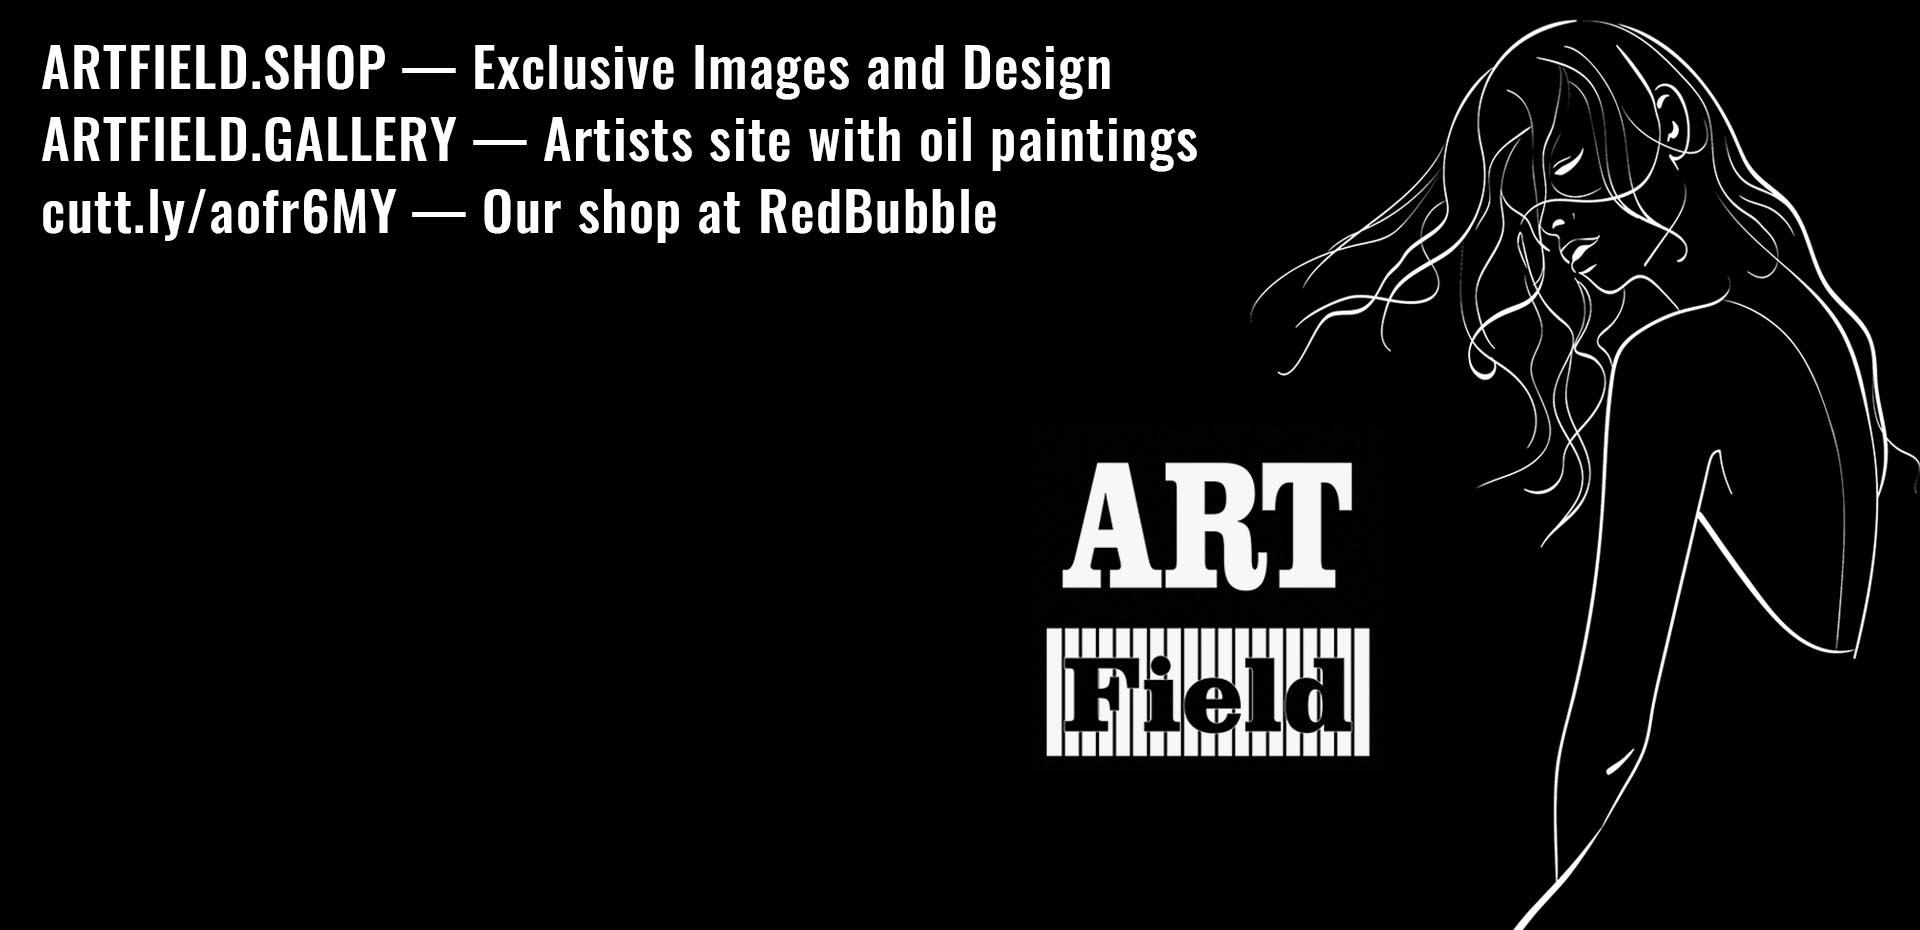 Artfield.Shop Contacts